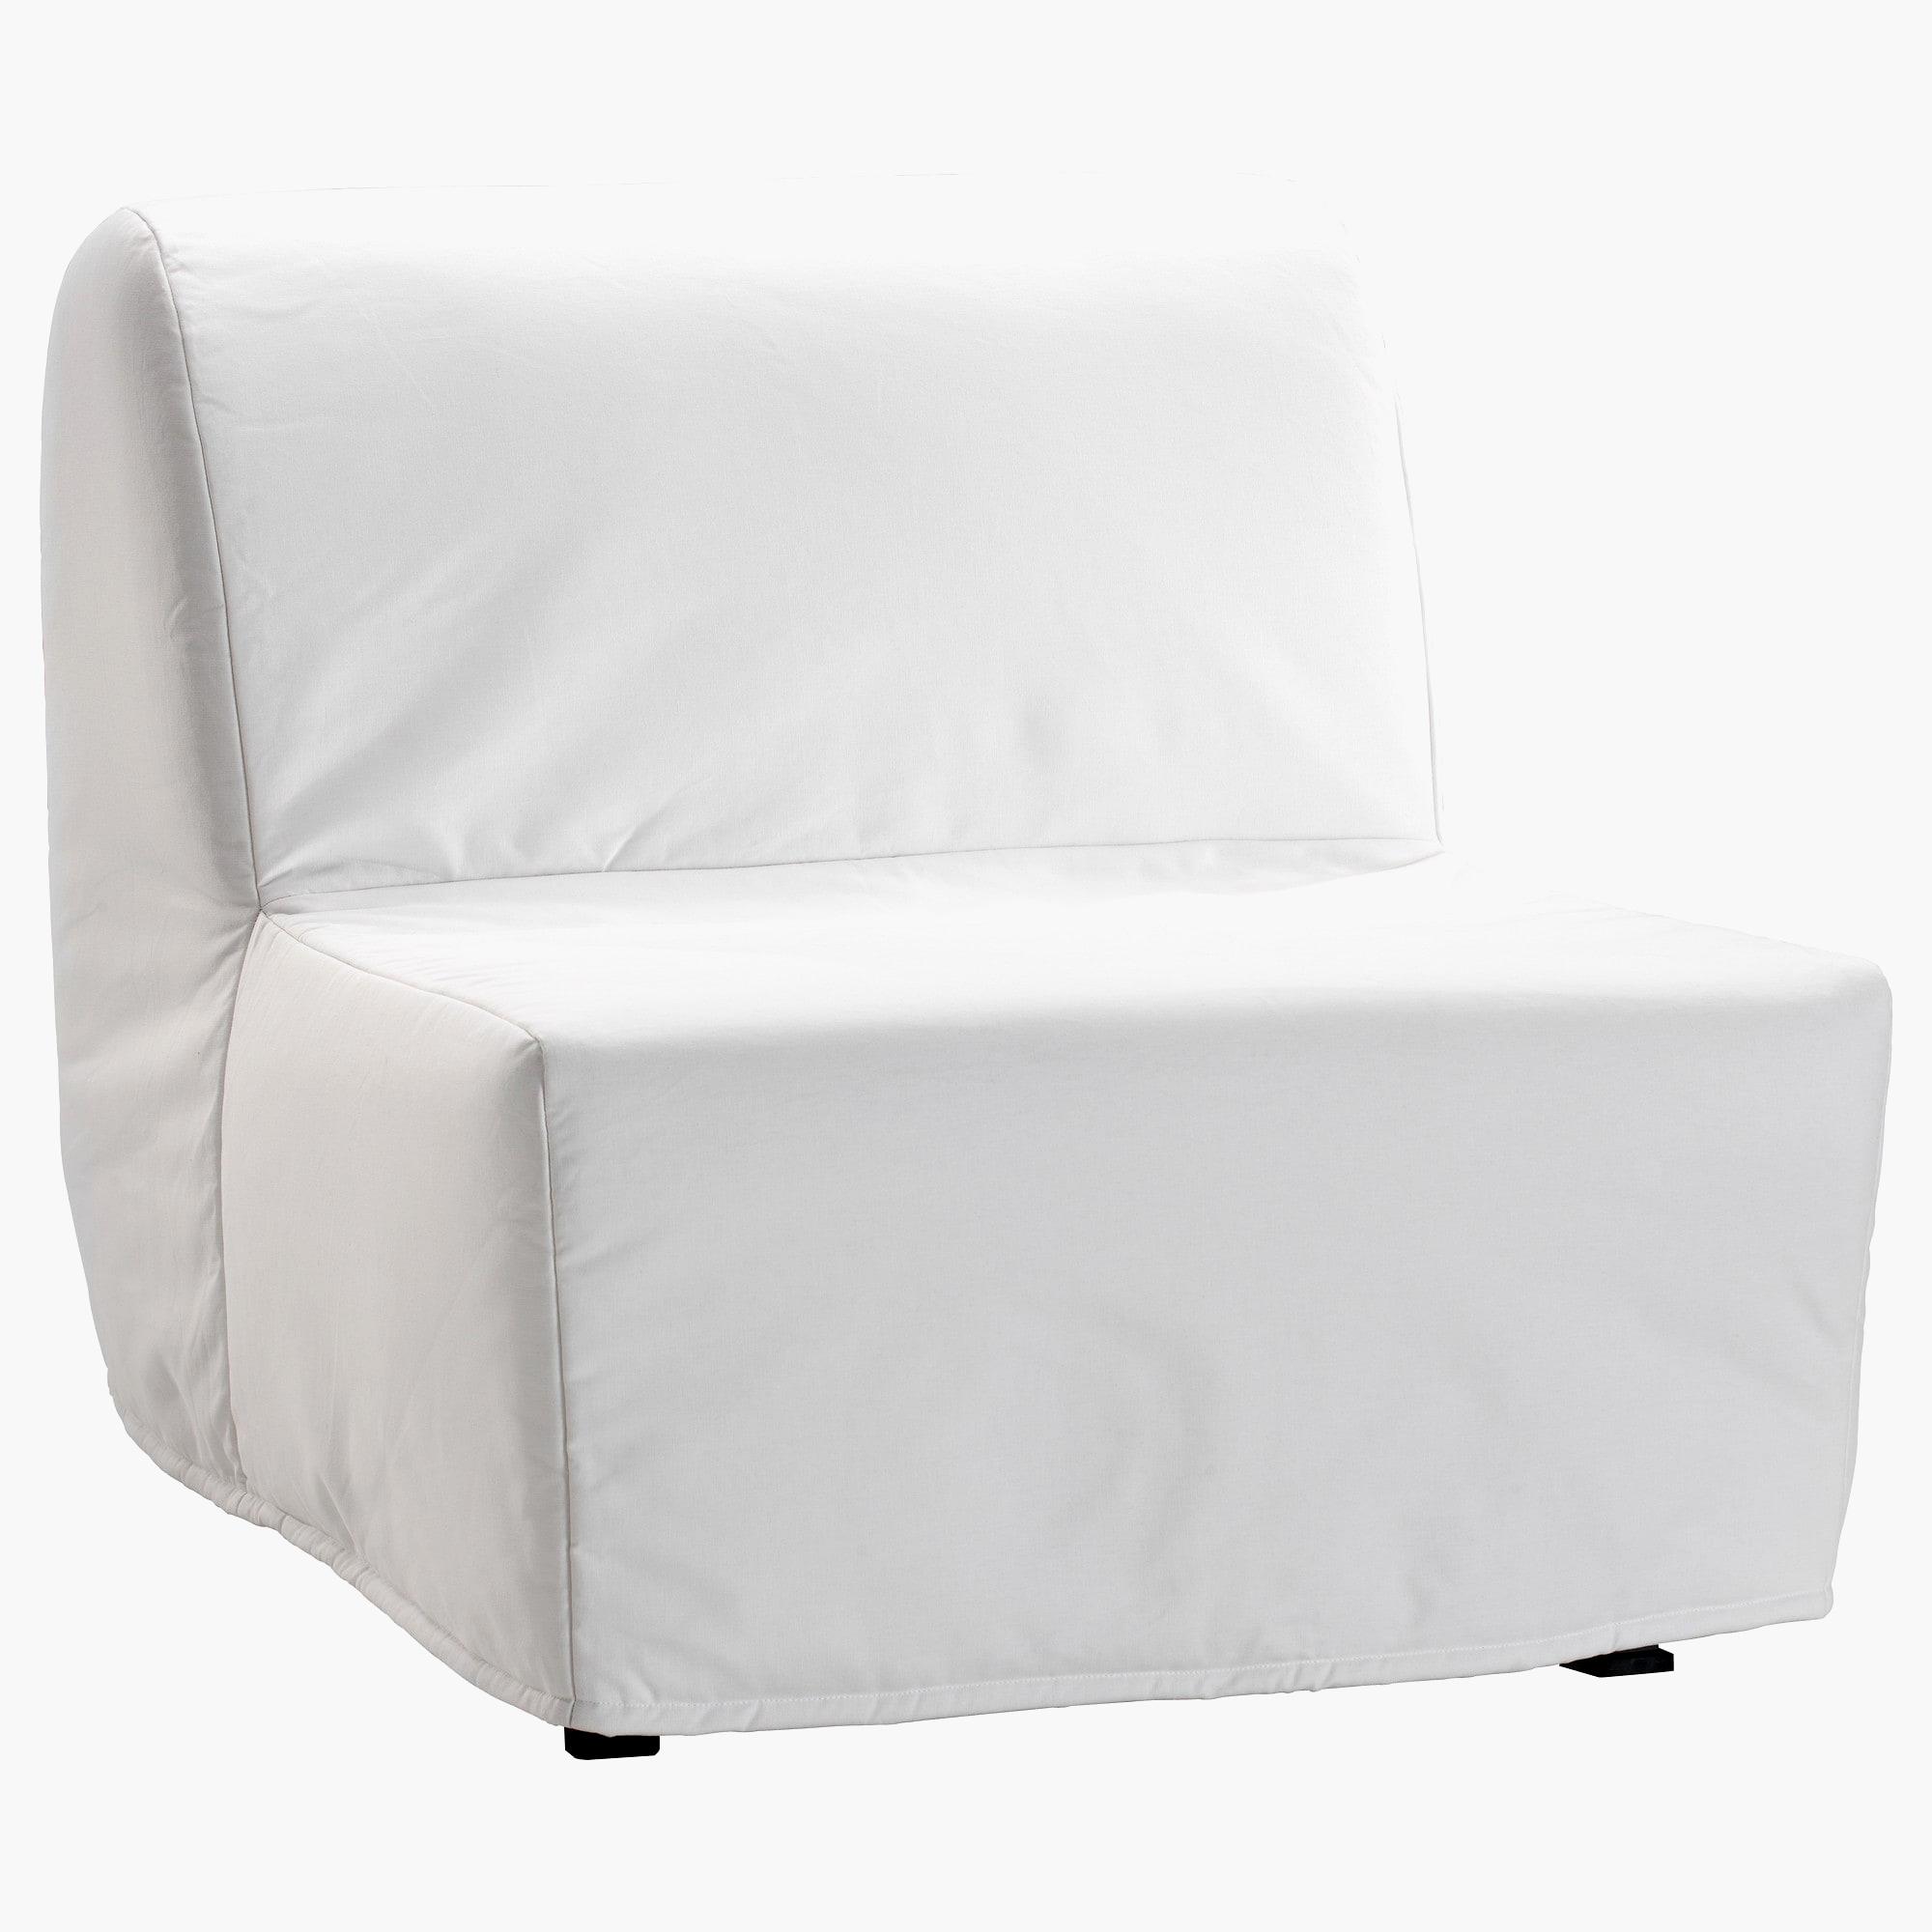 Telas Para Cubrir sofas Ikea Q5df Telas Para Cubrir sofas Ikea Sillones Cama Mjmhomeinspections